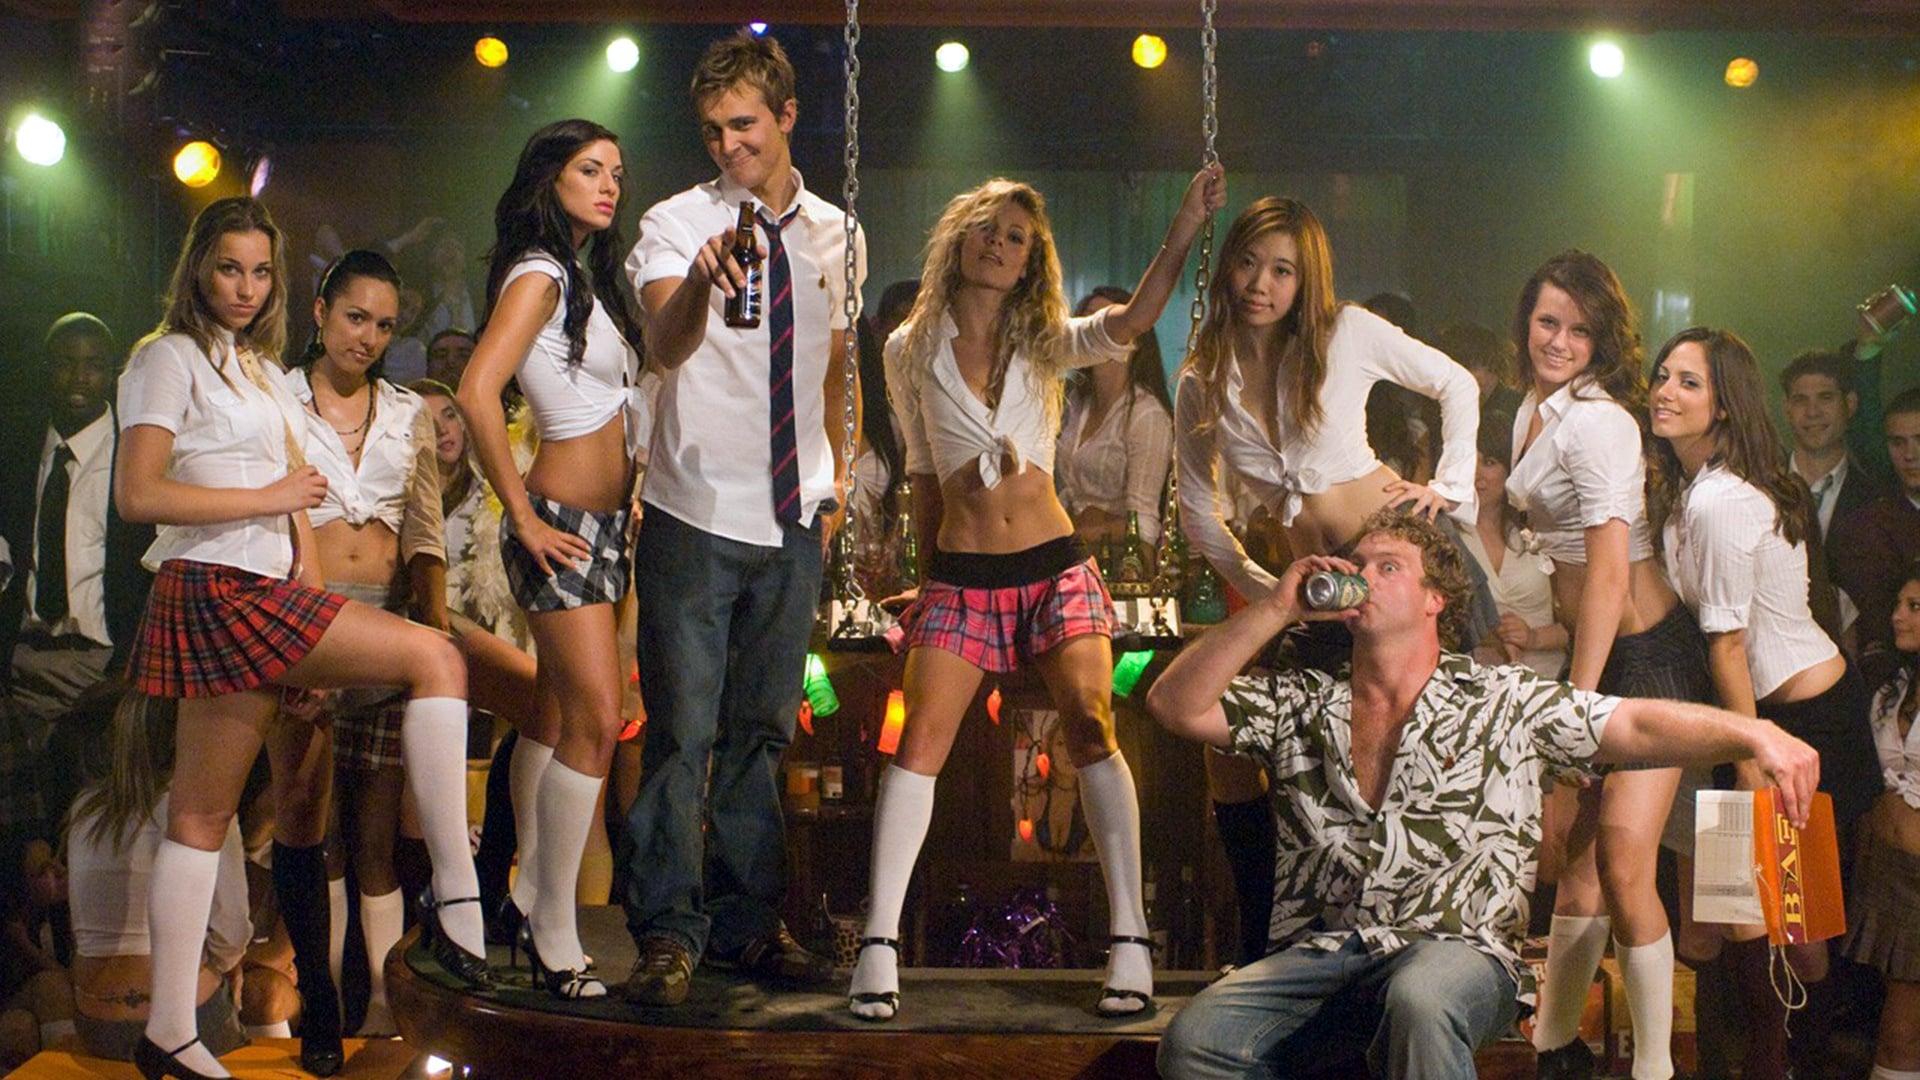 American Pie Presents Beta House Sex Scene american pie presents: beta house movie review - mikeymo